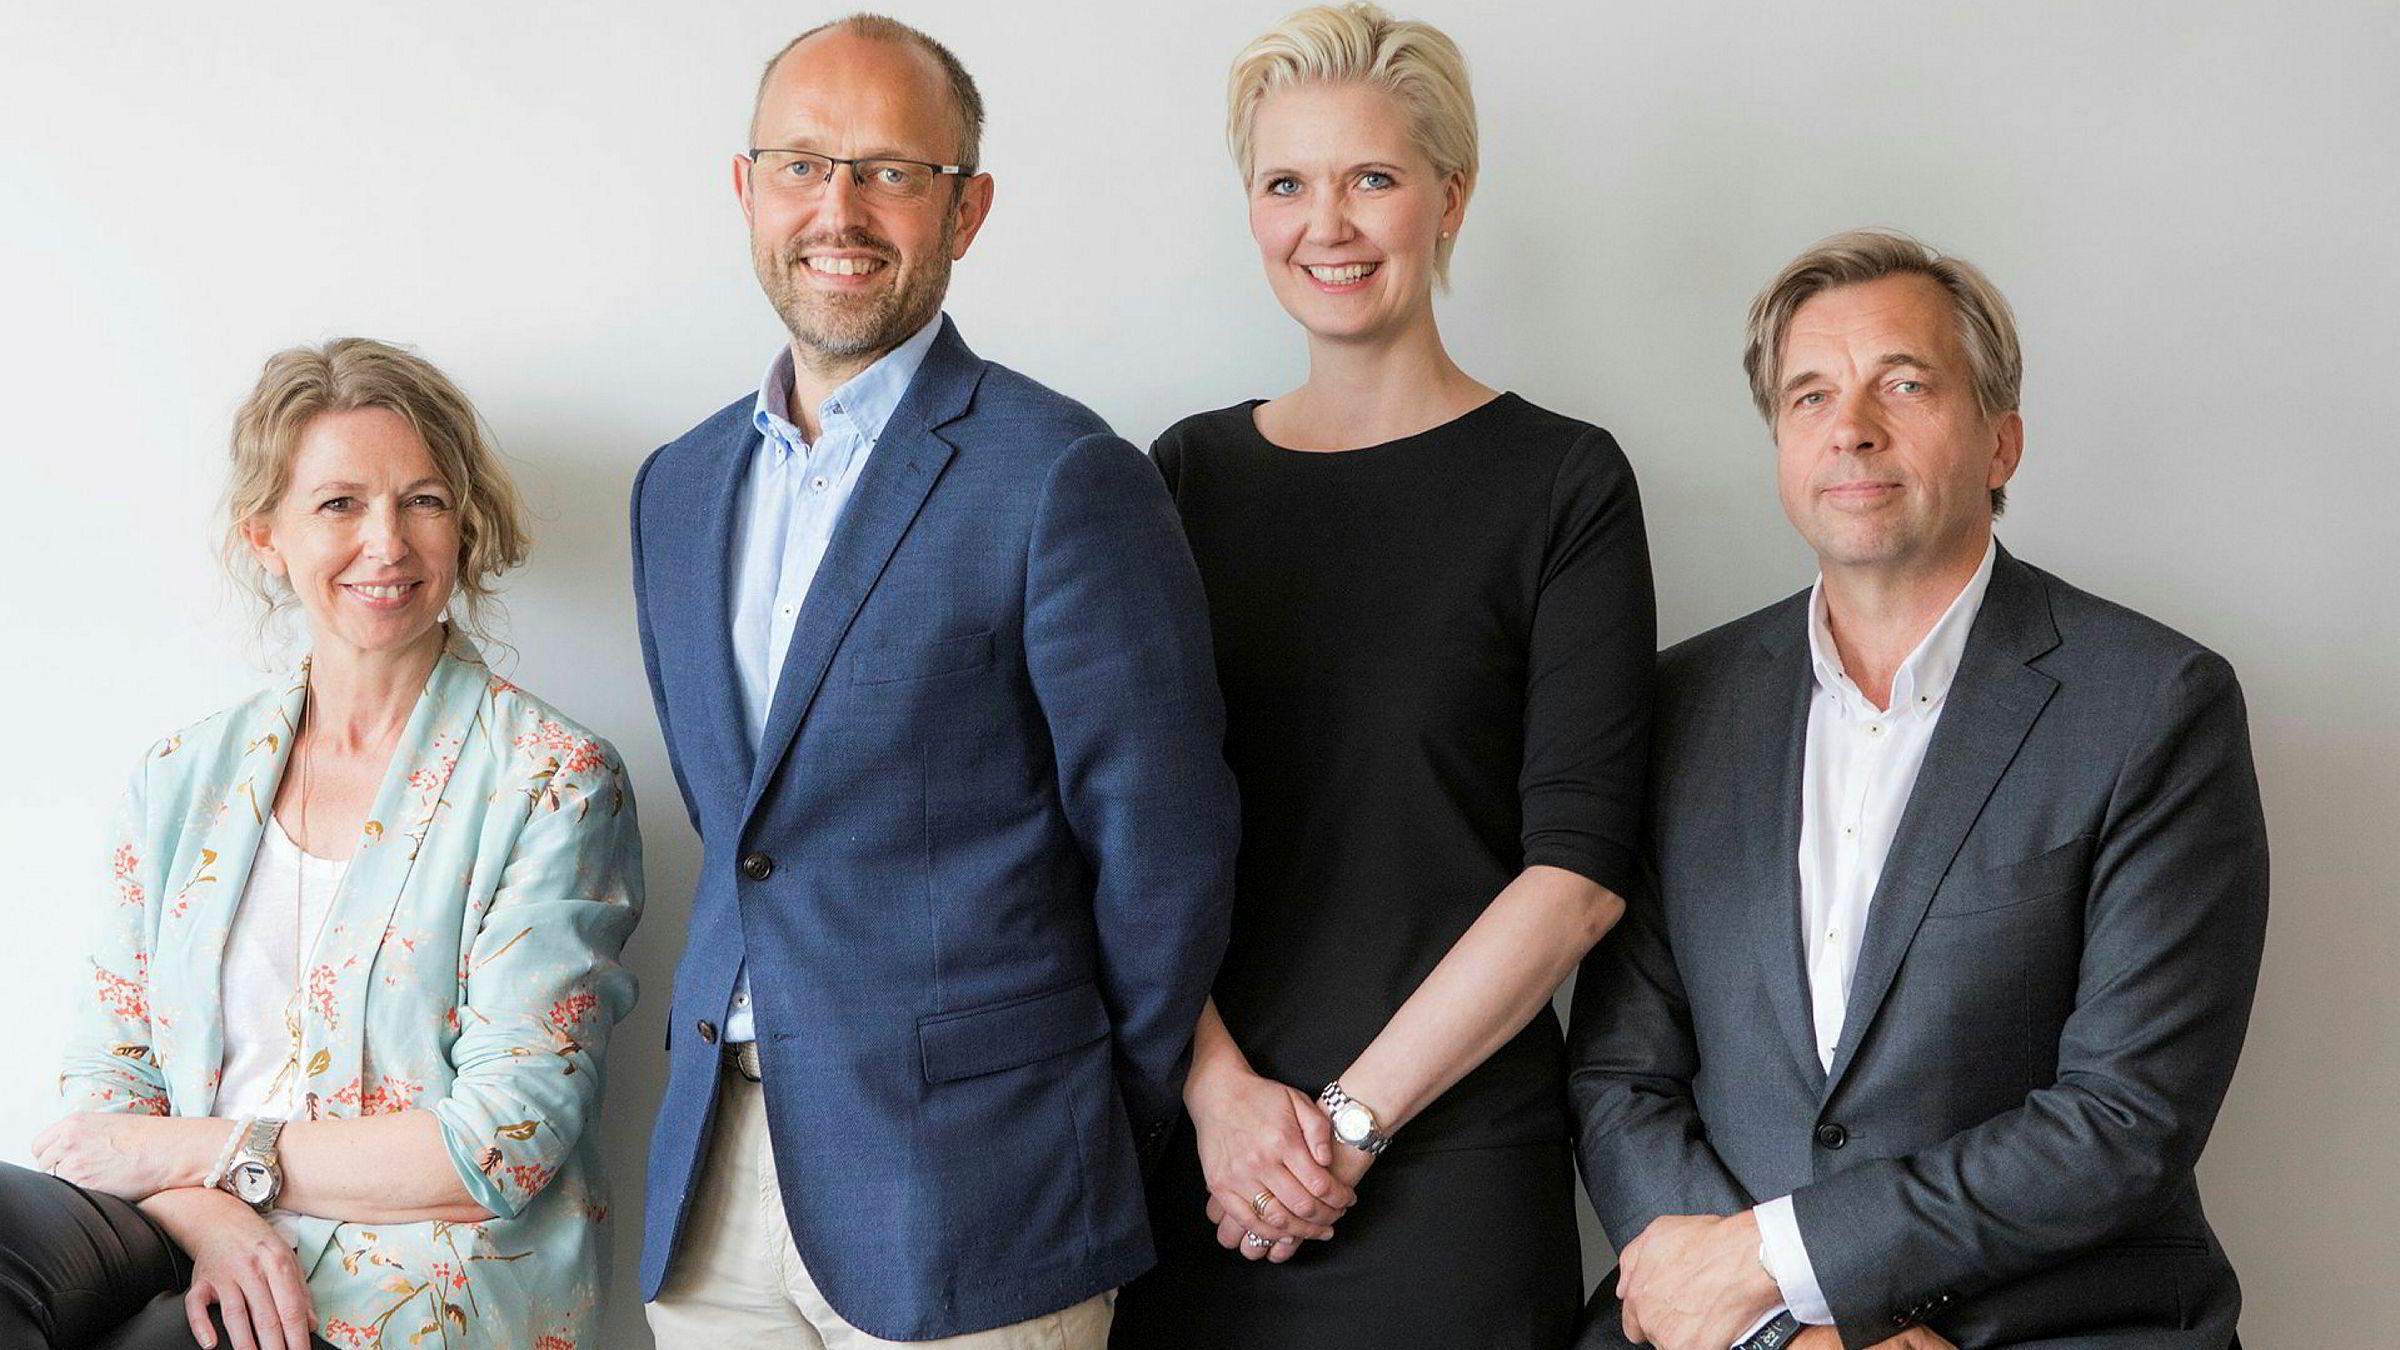 Fra venstre: Christina Dorthellinger Nygaard, Mads Yngve Storvik, Tina Mari Flem og Geir Terje Ruud. Foto: Thomas Brun / NTB scanpix